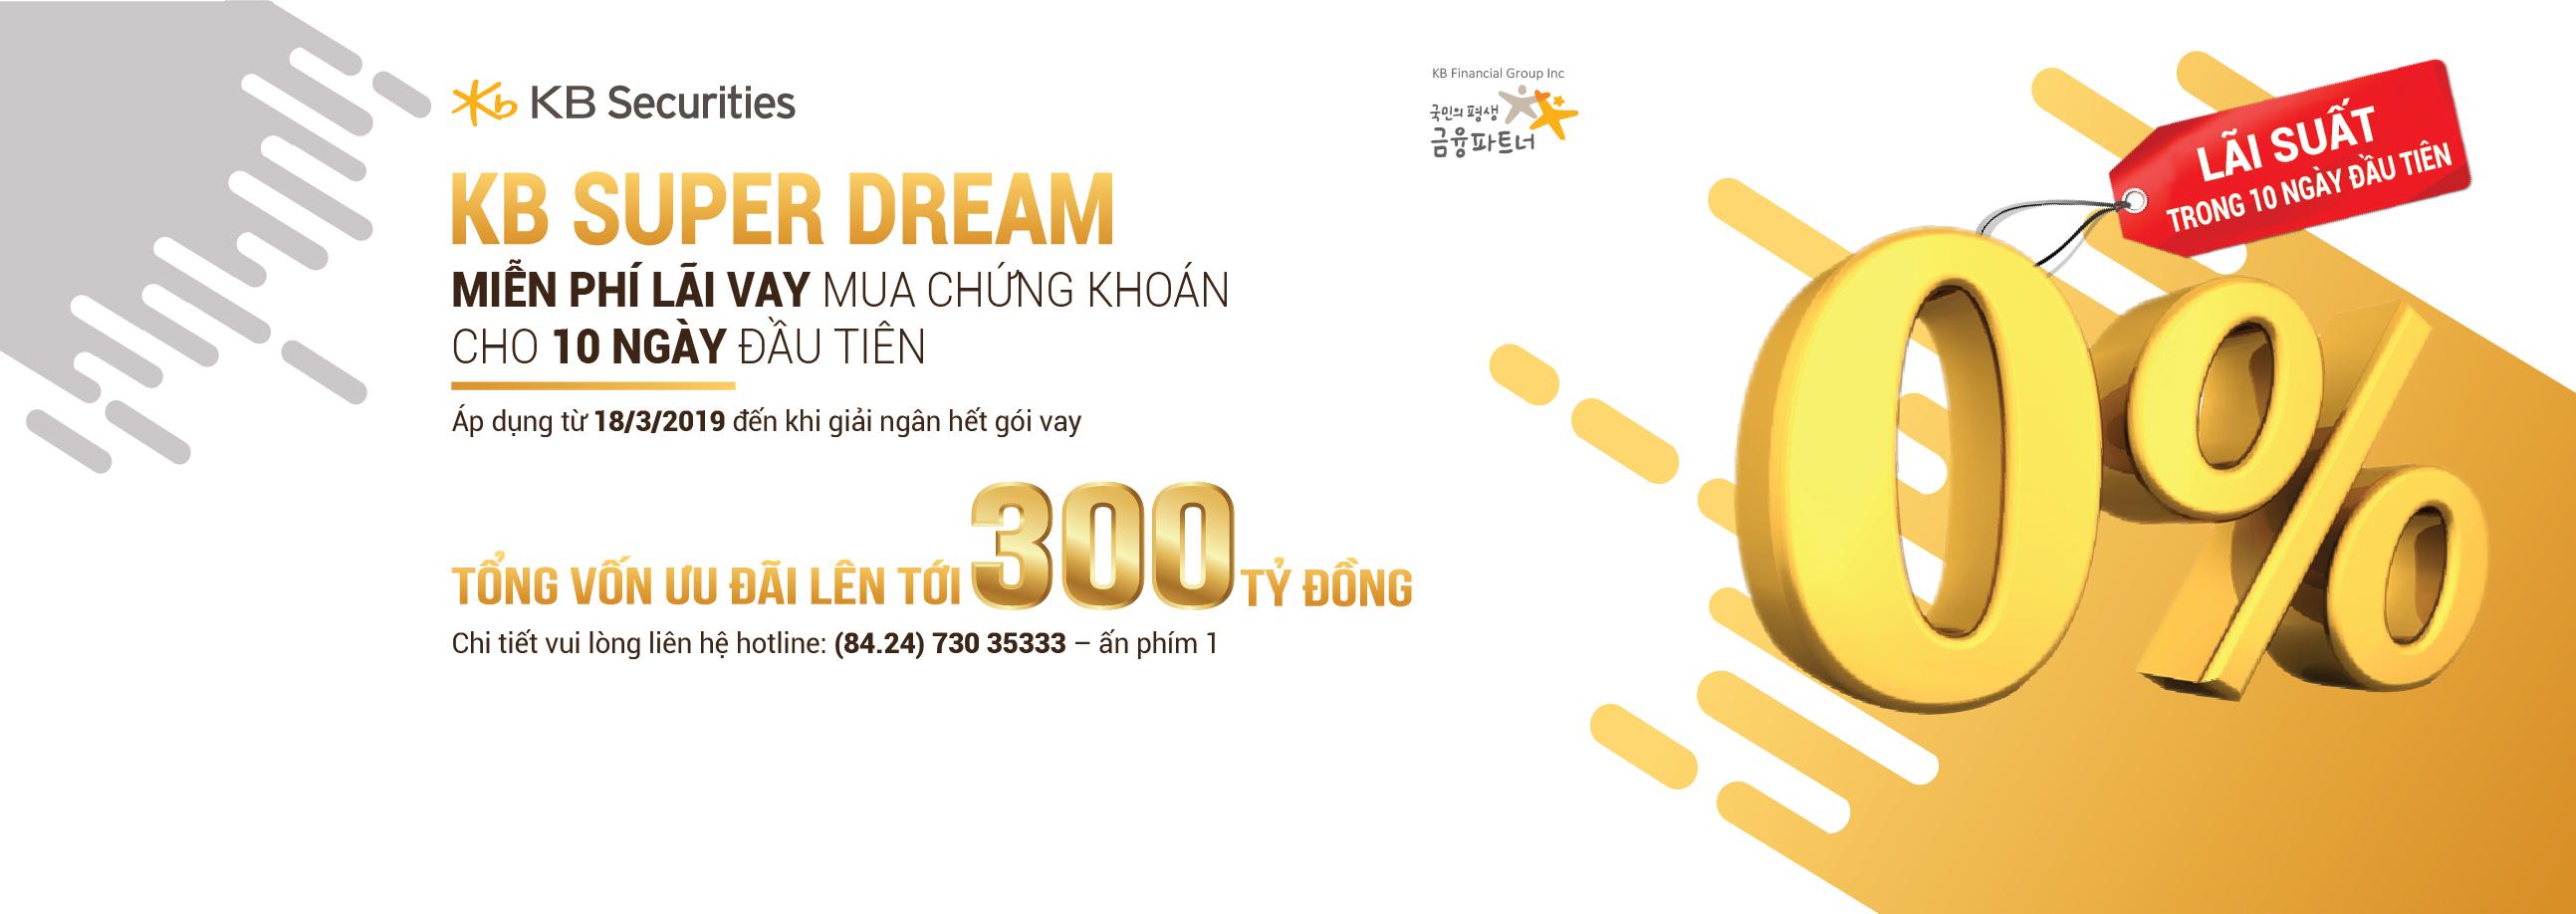 KB Super Dream